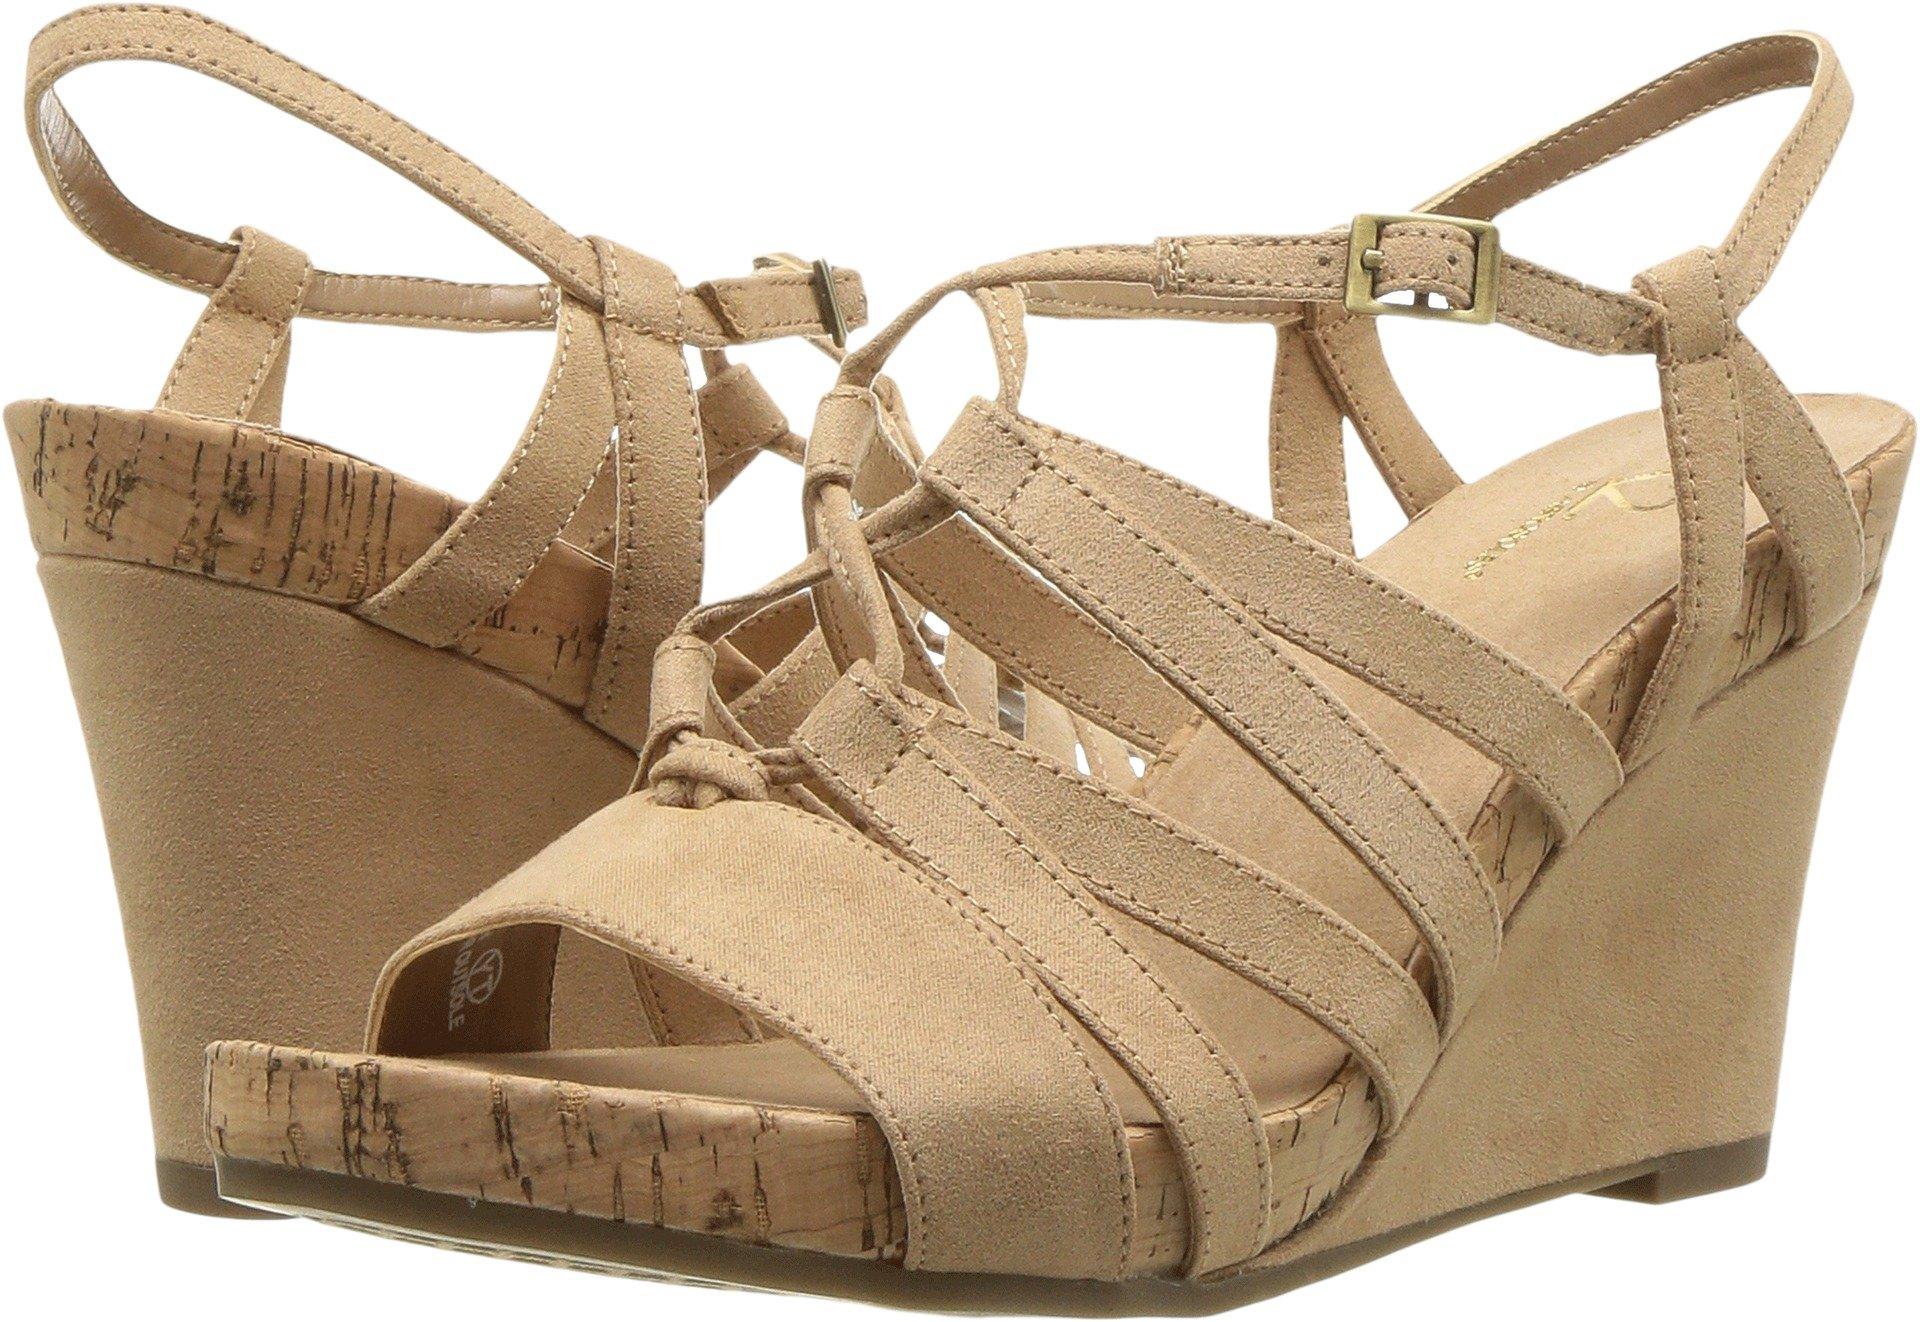 Aerosoles A2 Women's Poppy Plush Wedge Sandal, Light Tan, 9 M US